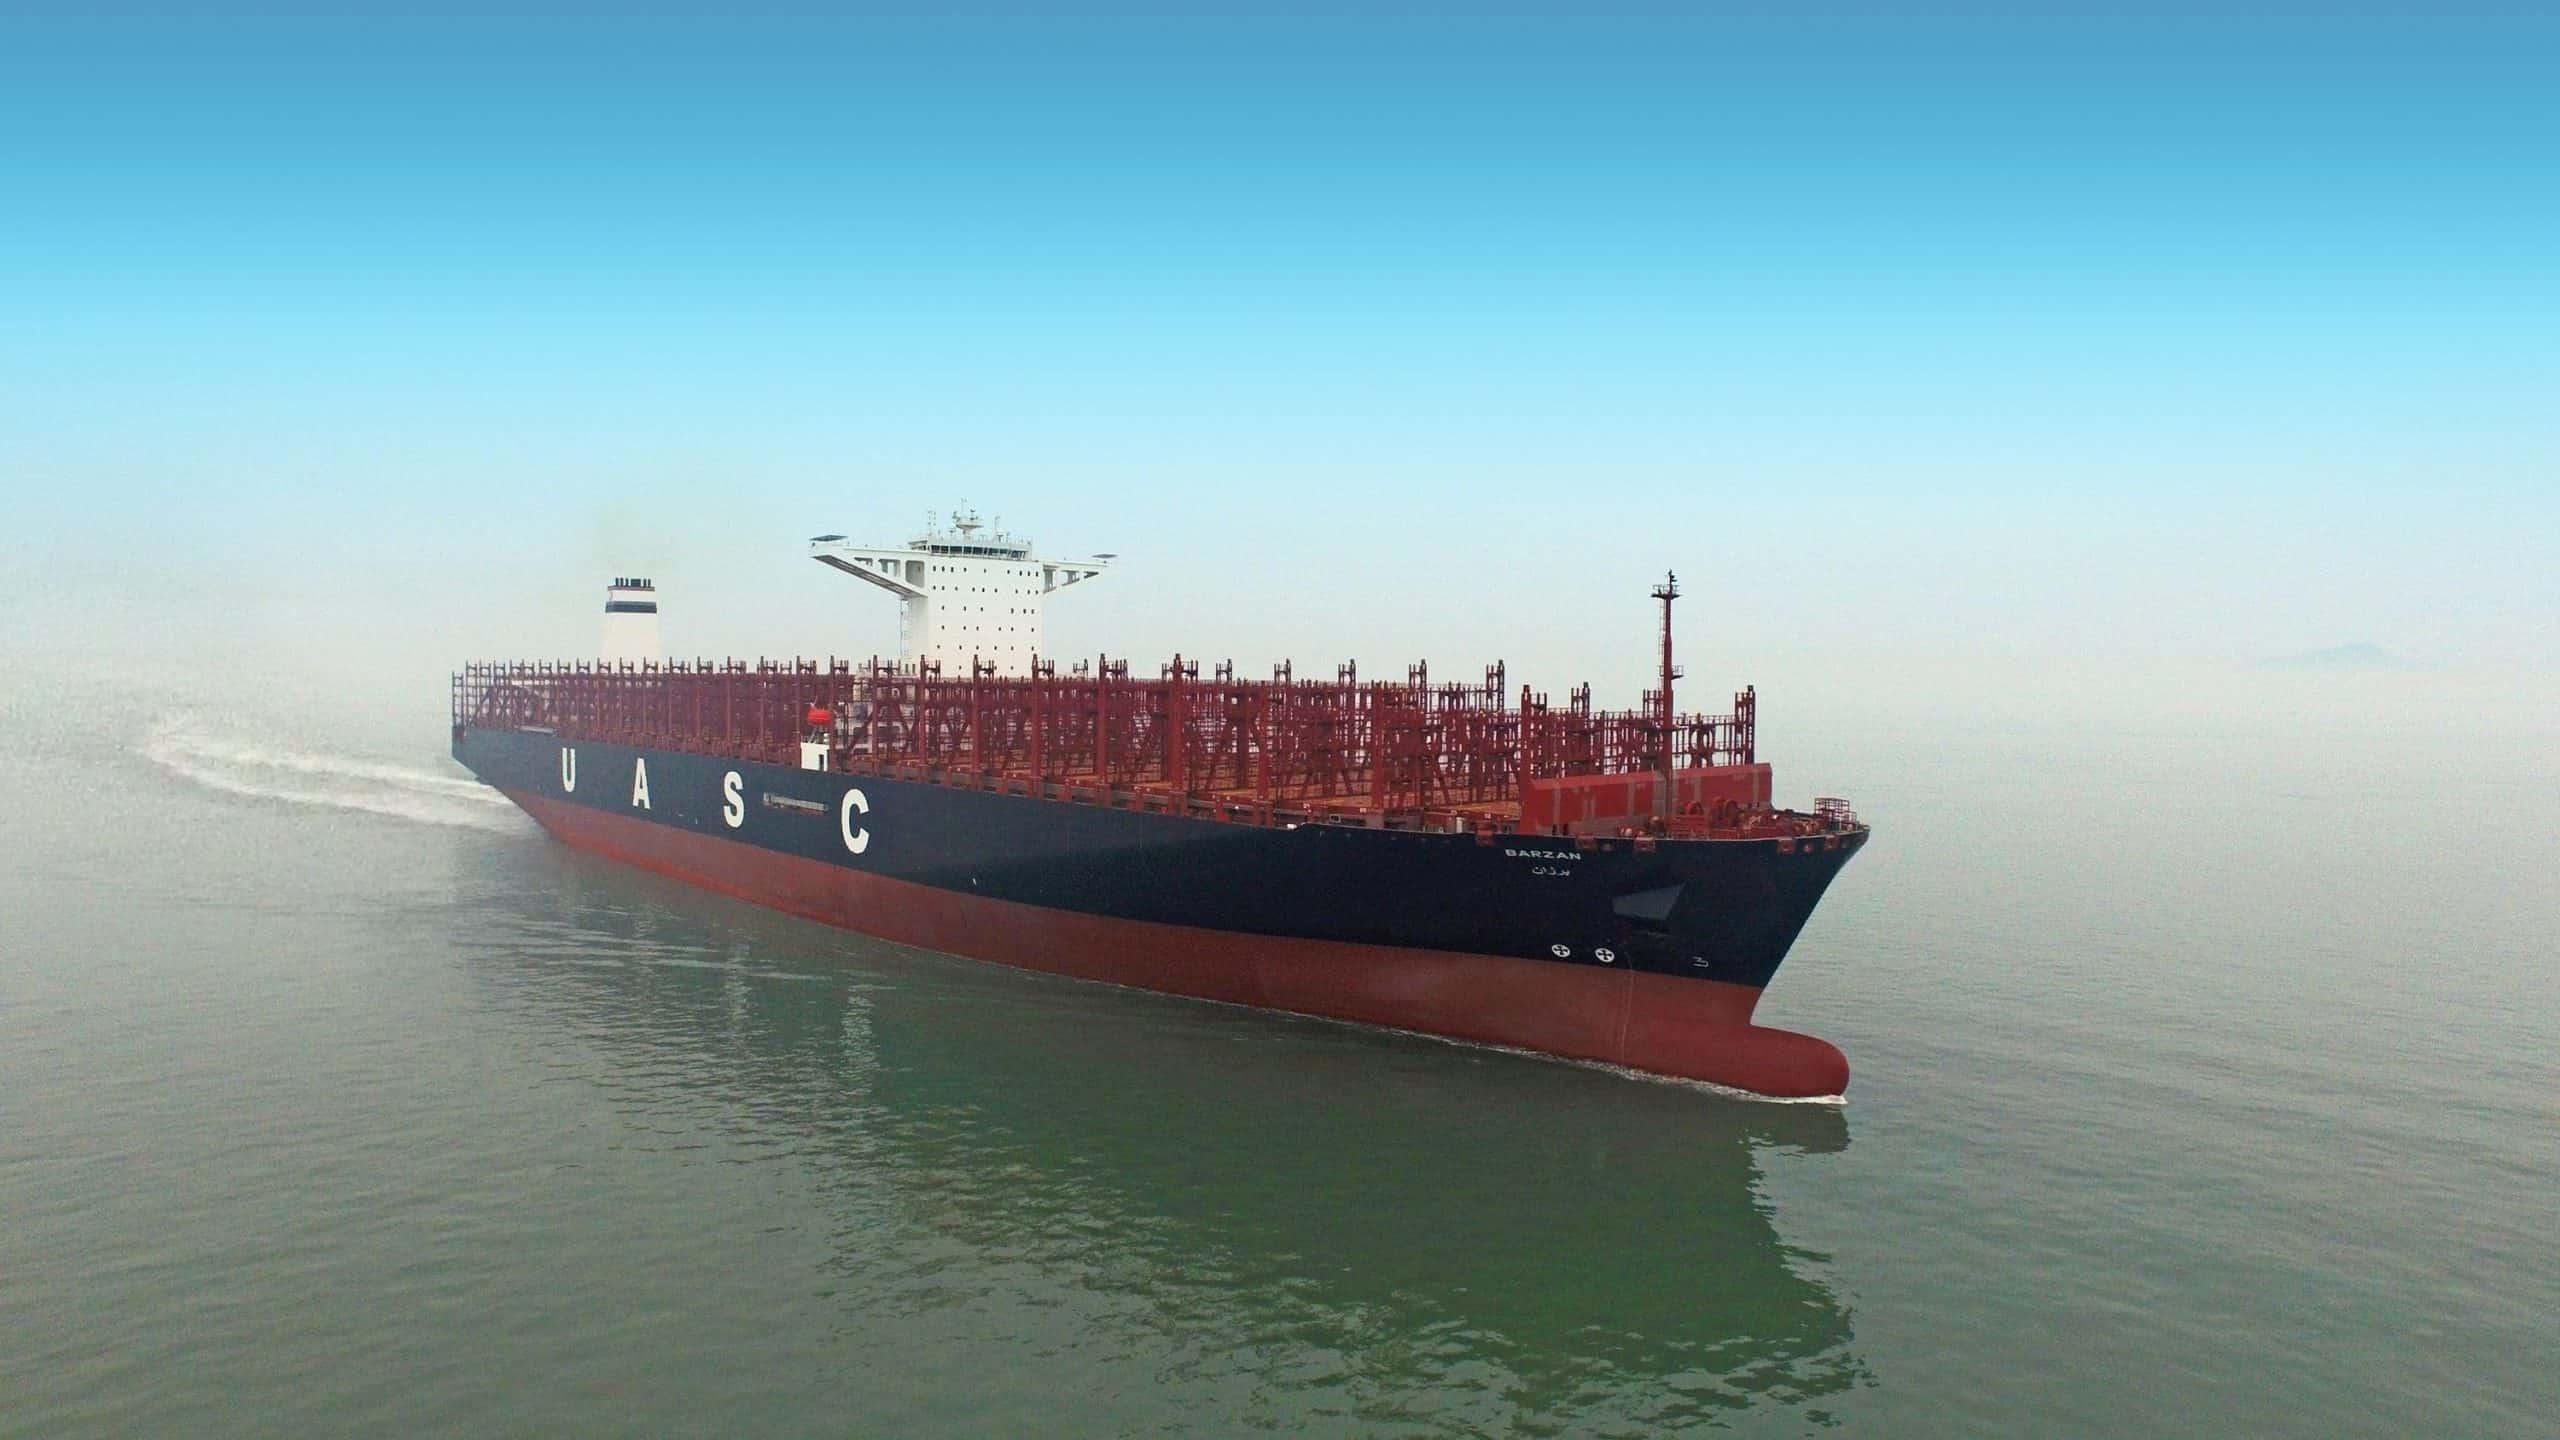 UASC names first LNG-ready 18,800 teu vessel